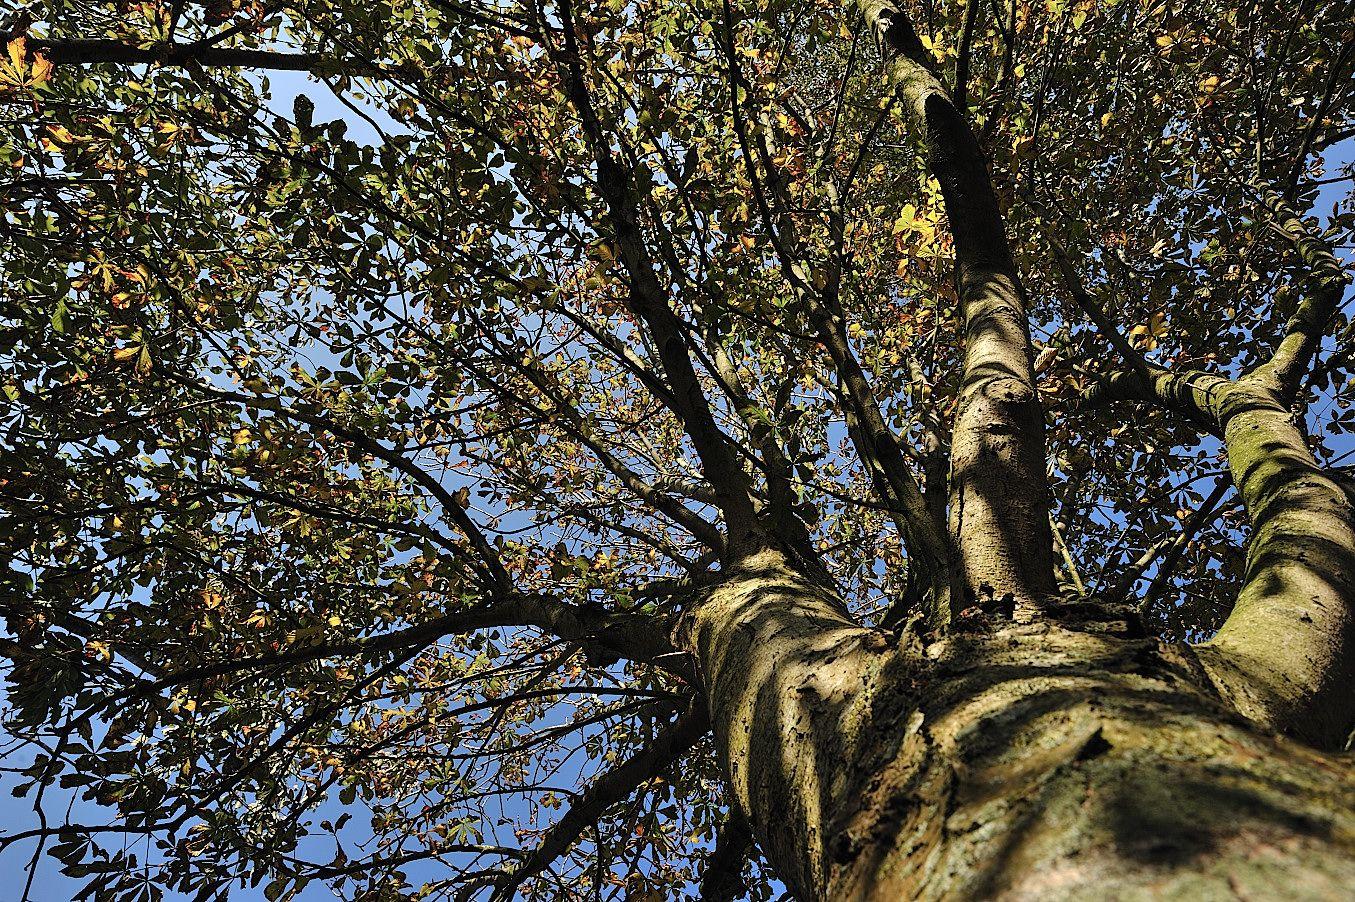 Marronnier commun, Les arbres - MonSitePhotos - MonSitePhotos